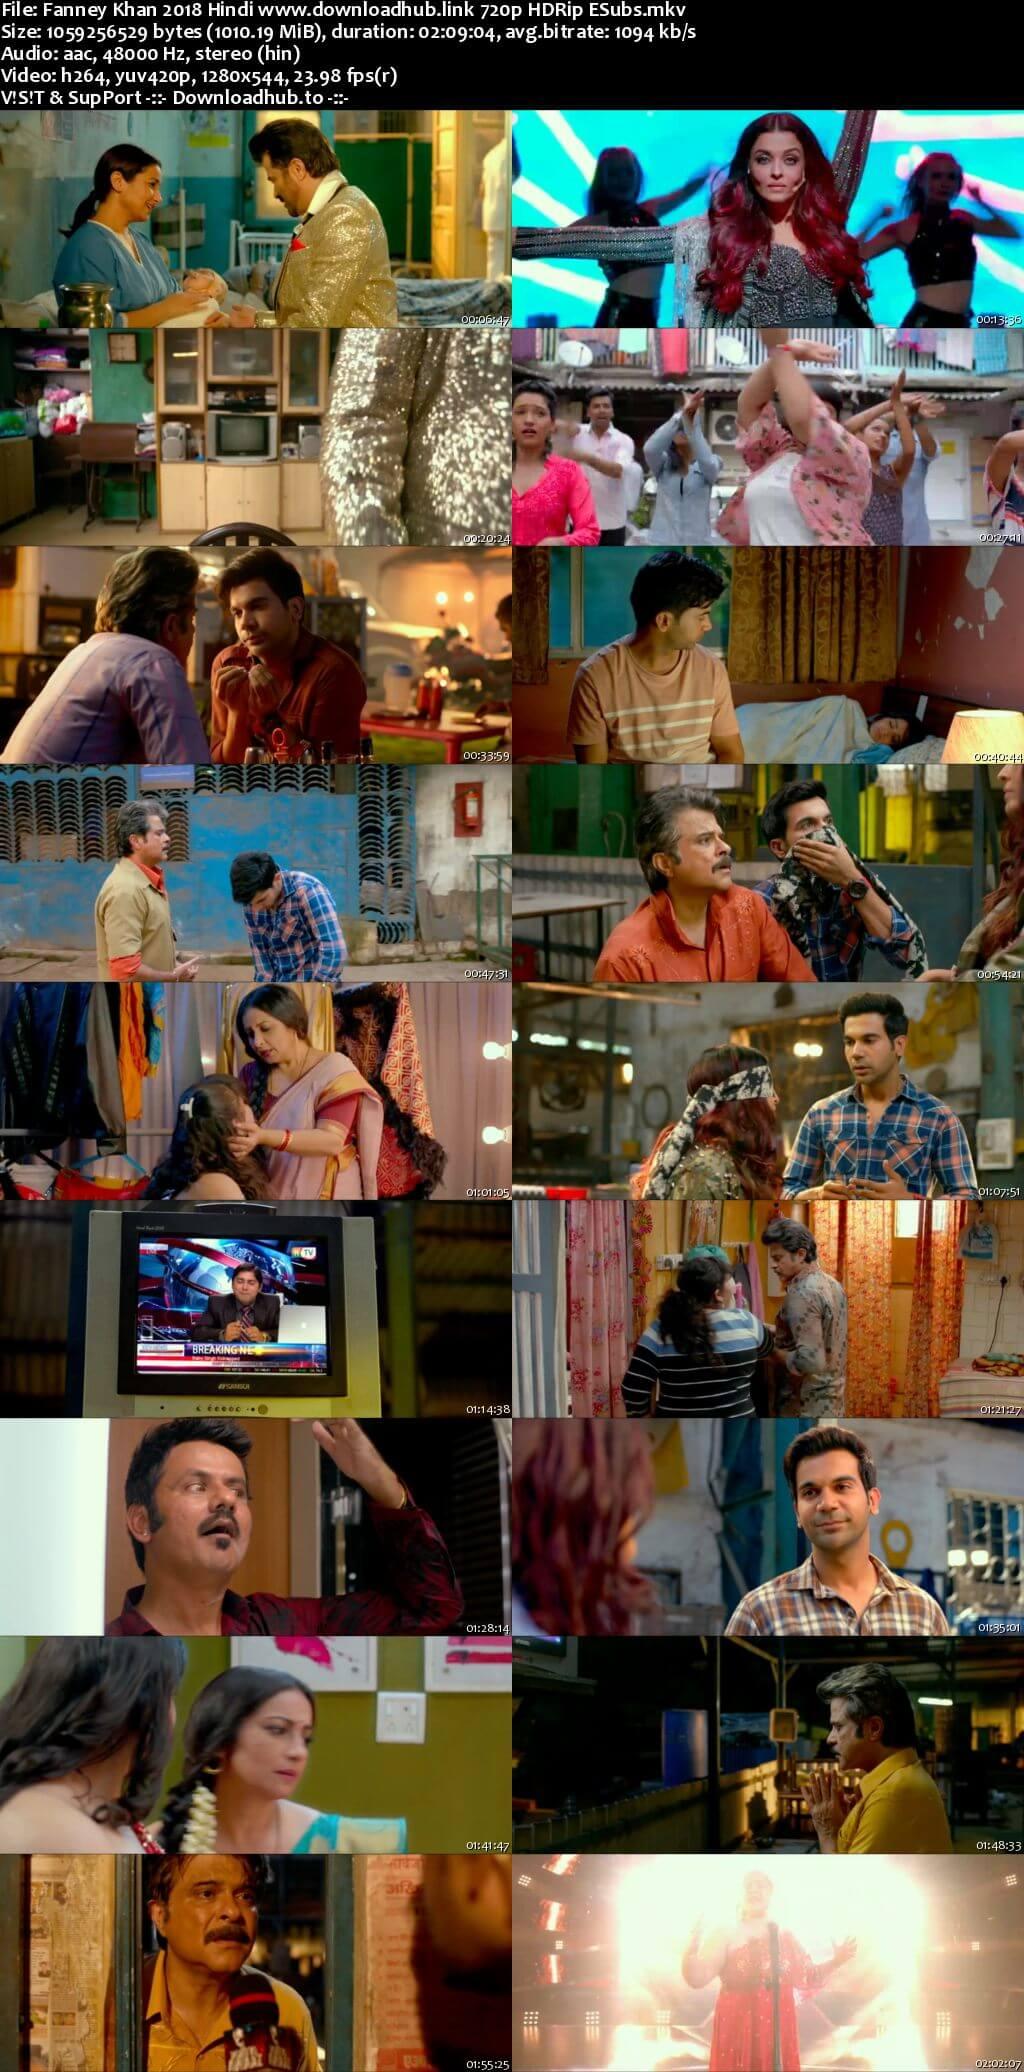 Fanney Khan 2018 Hindi 720p HDRip ESubs